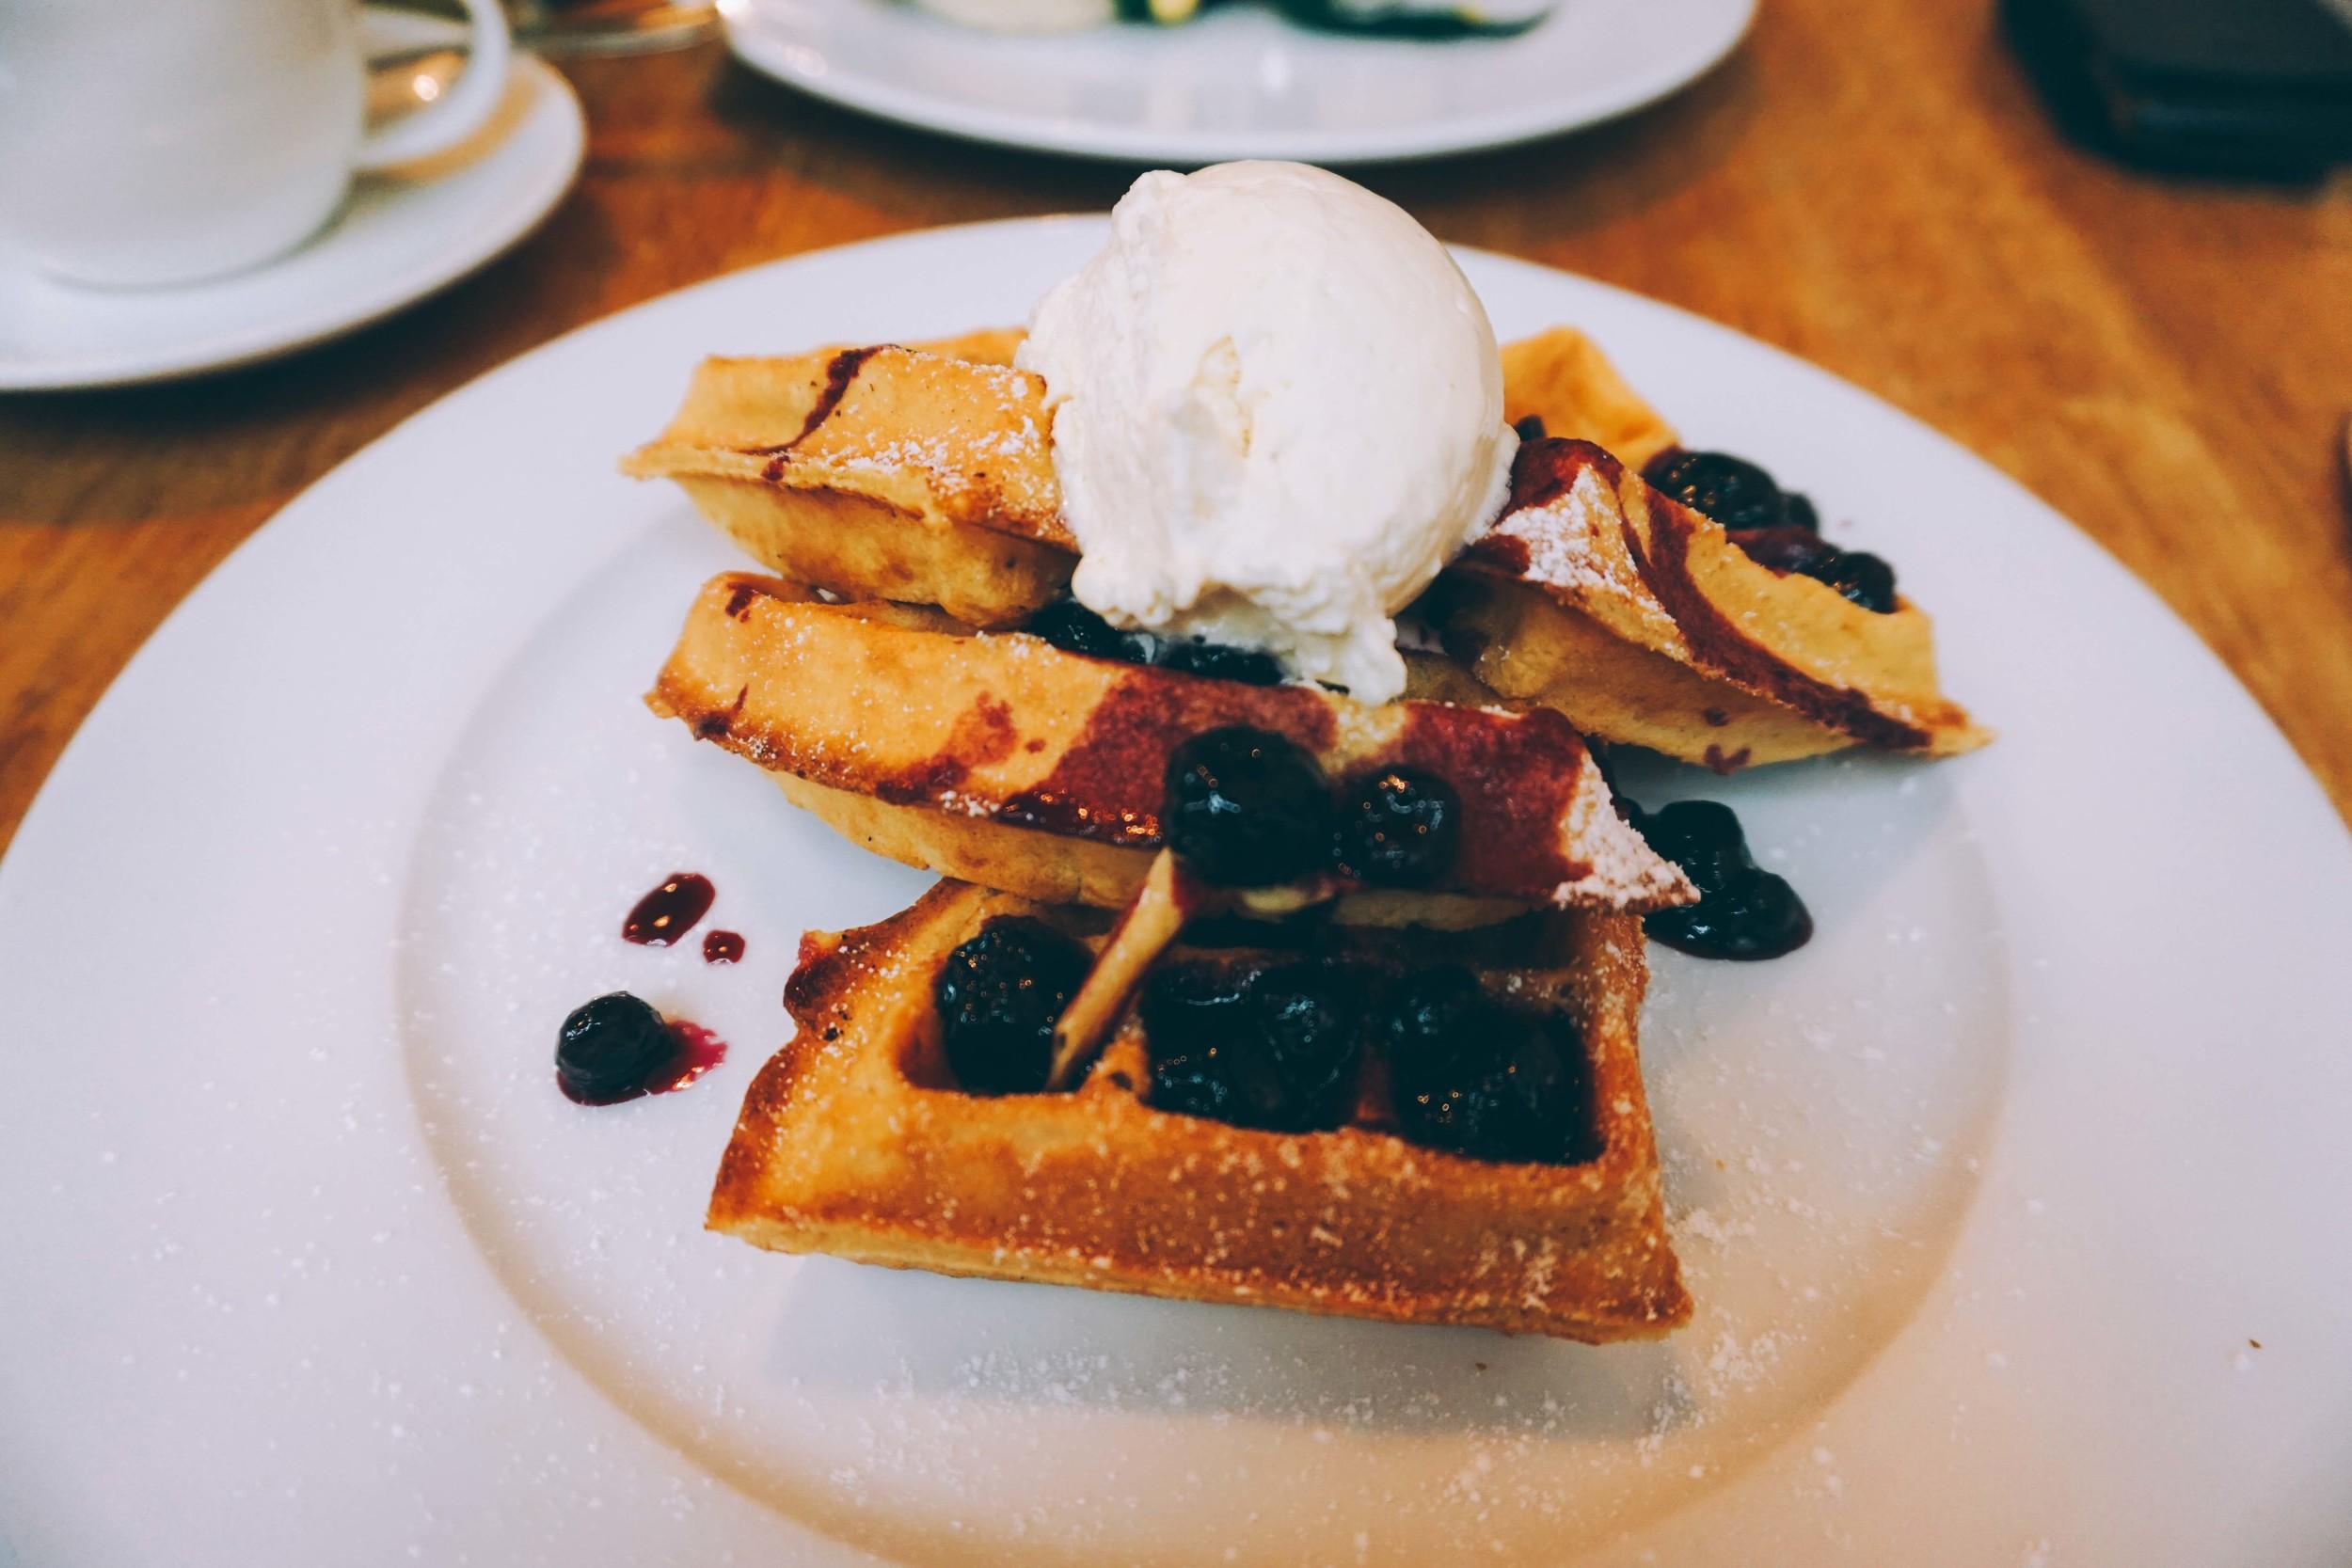 Tom's Kitchen, Chelsea. Waffles